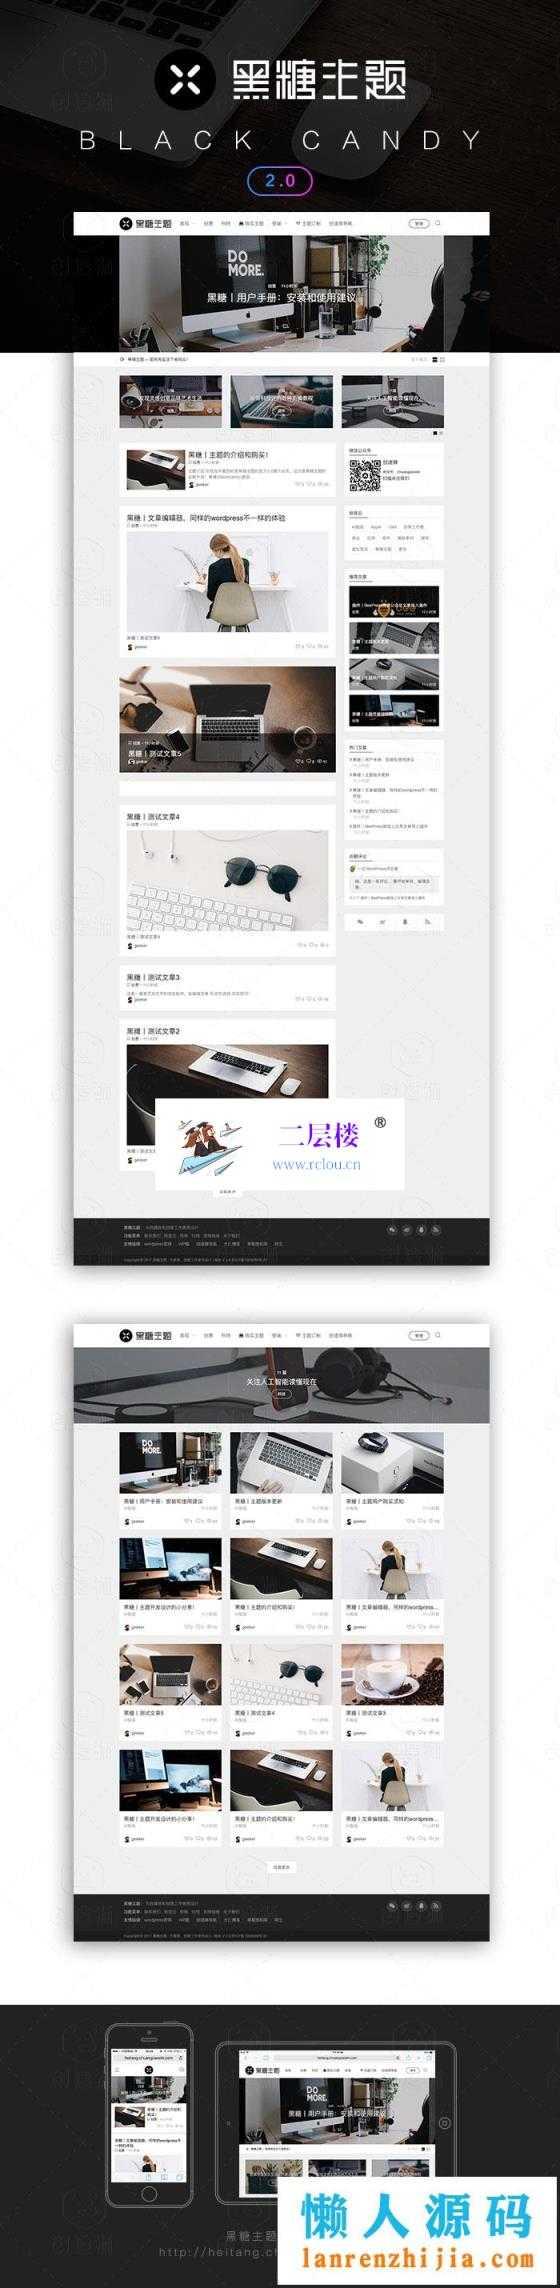 WordPress黑糖主题BlackCandy V1.53 自媒体和创意工作者博客主题模板_源码下载插图